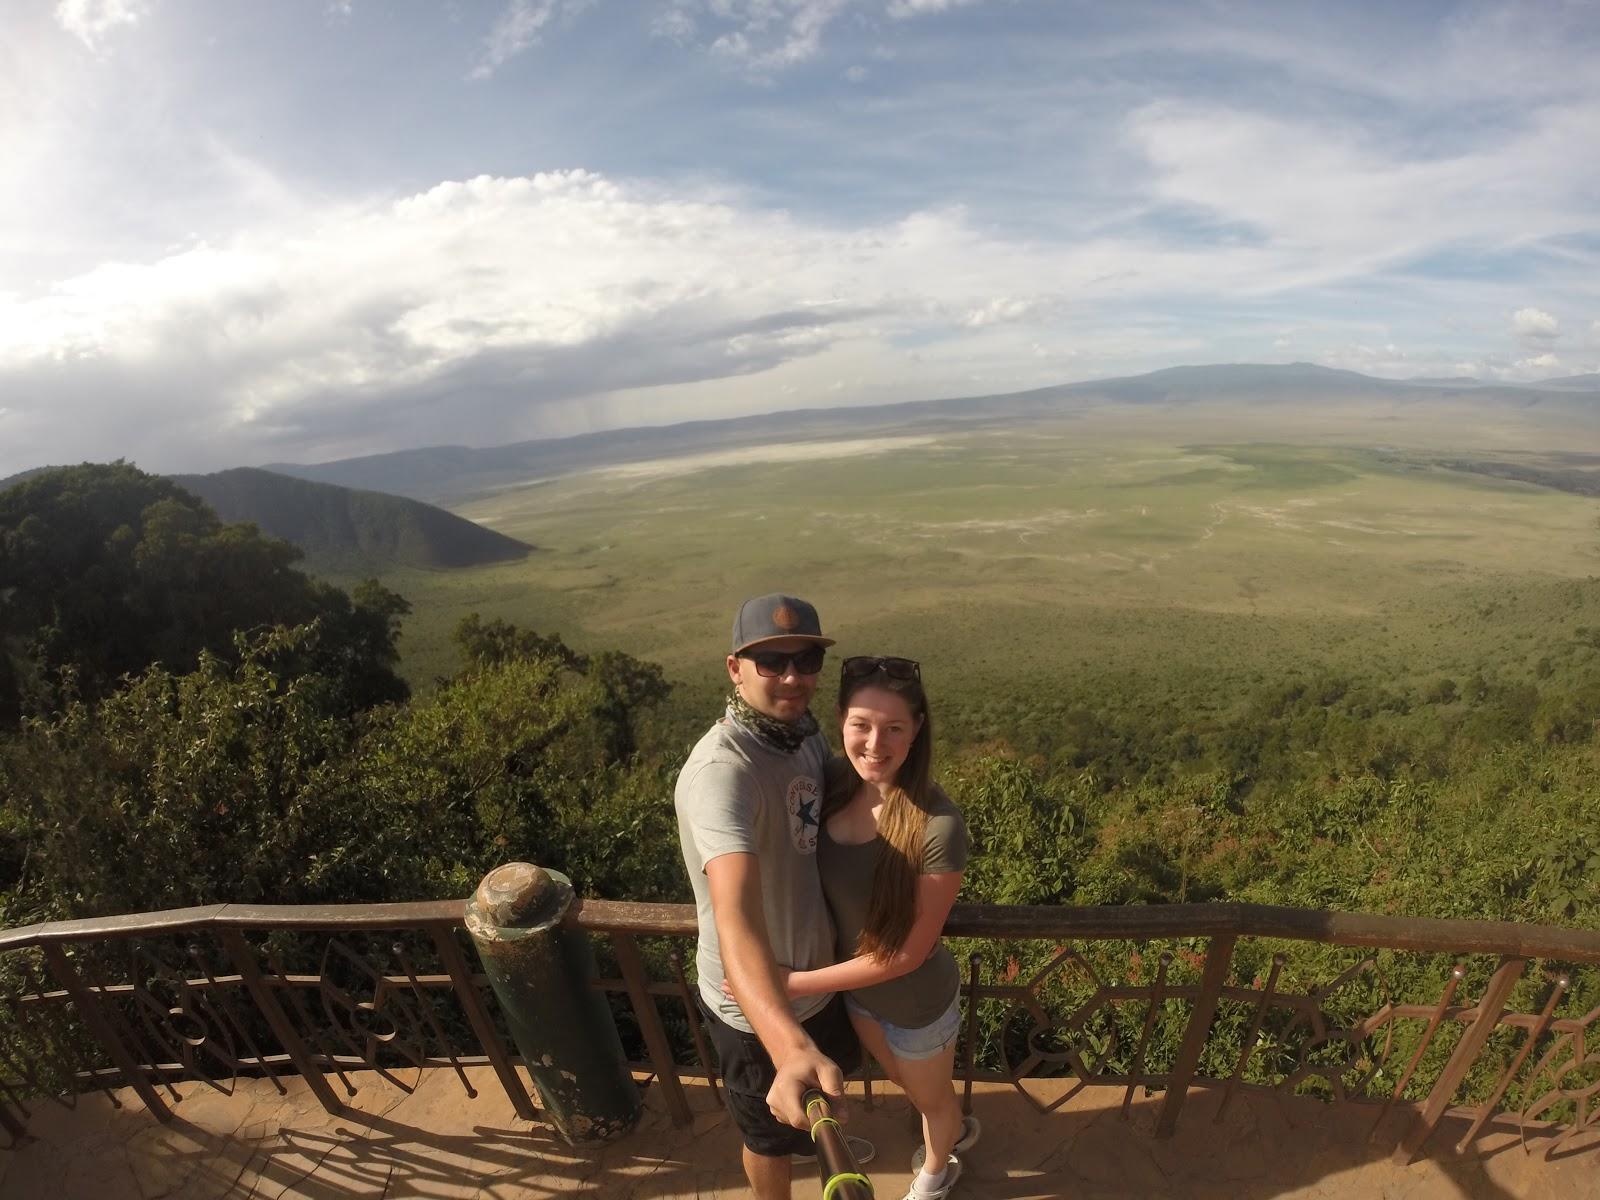 Kráter Ngorongoro